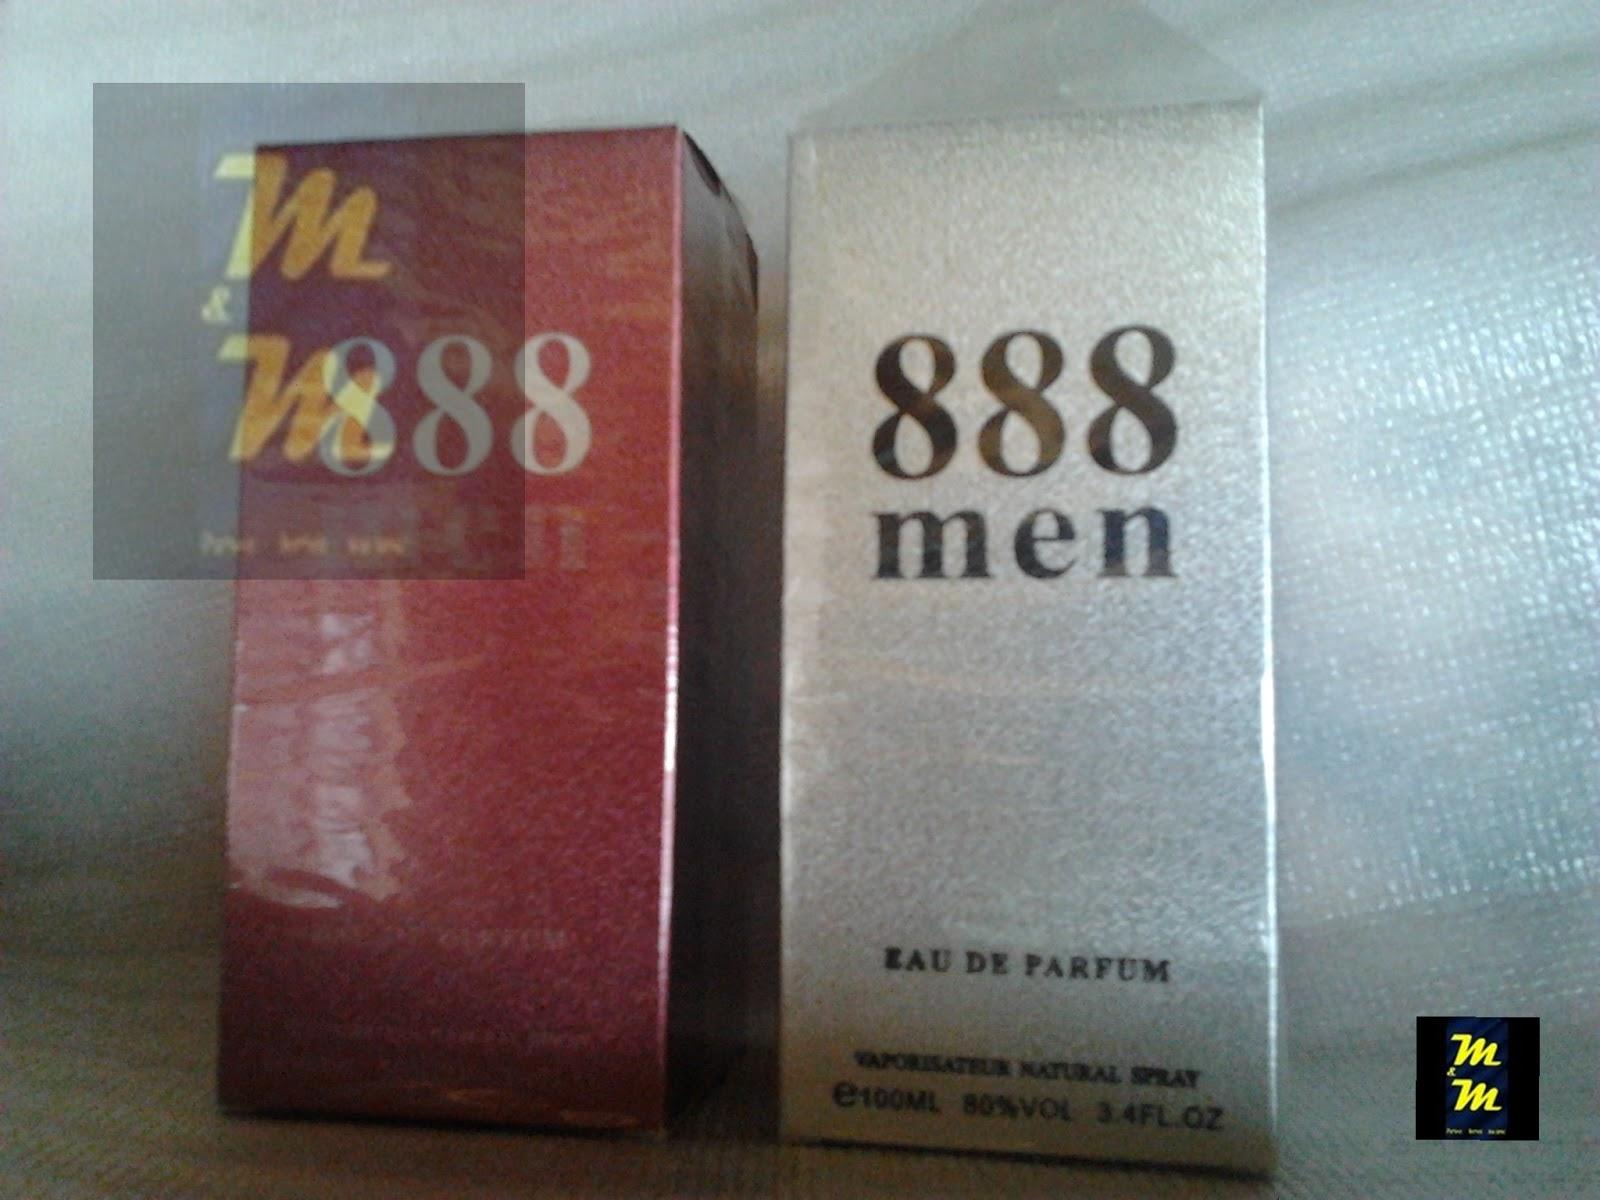 perfume 888 men